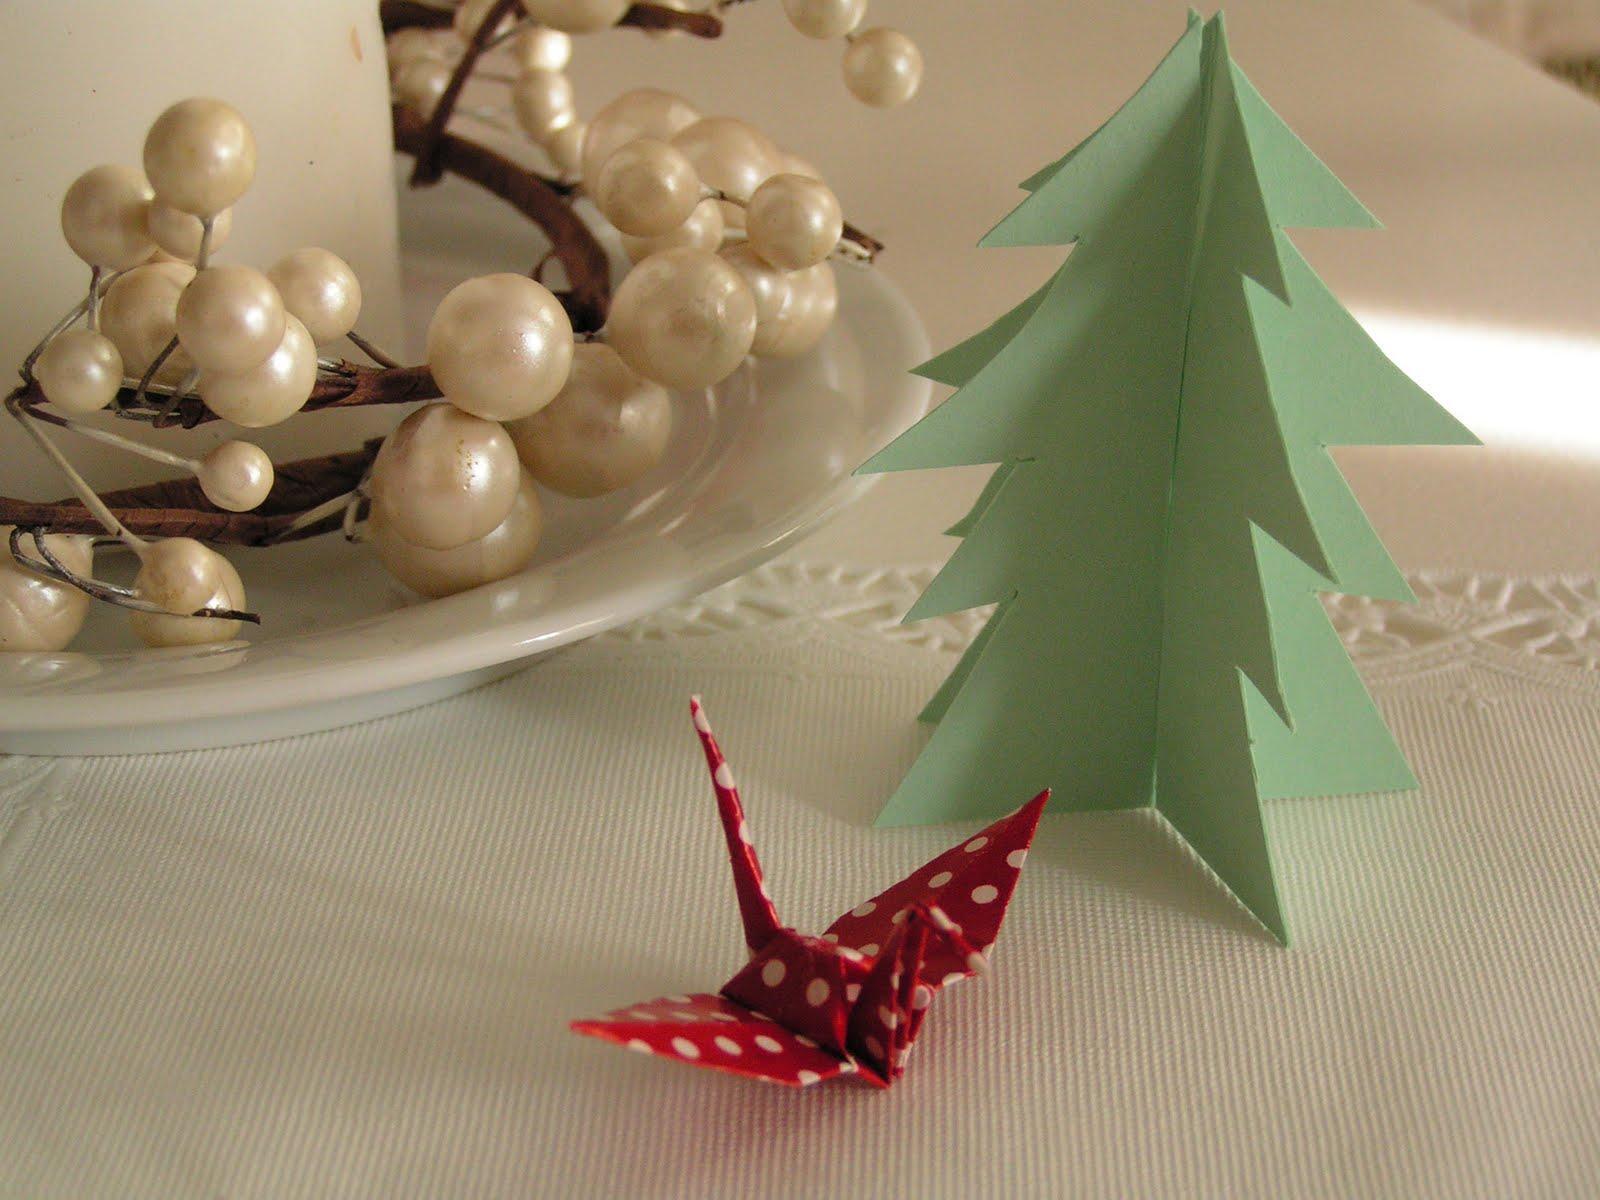 Origami crane and Christmas